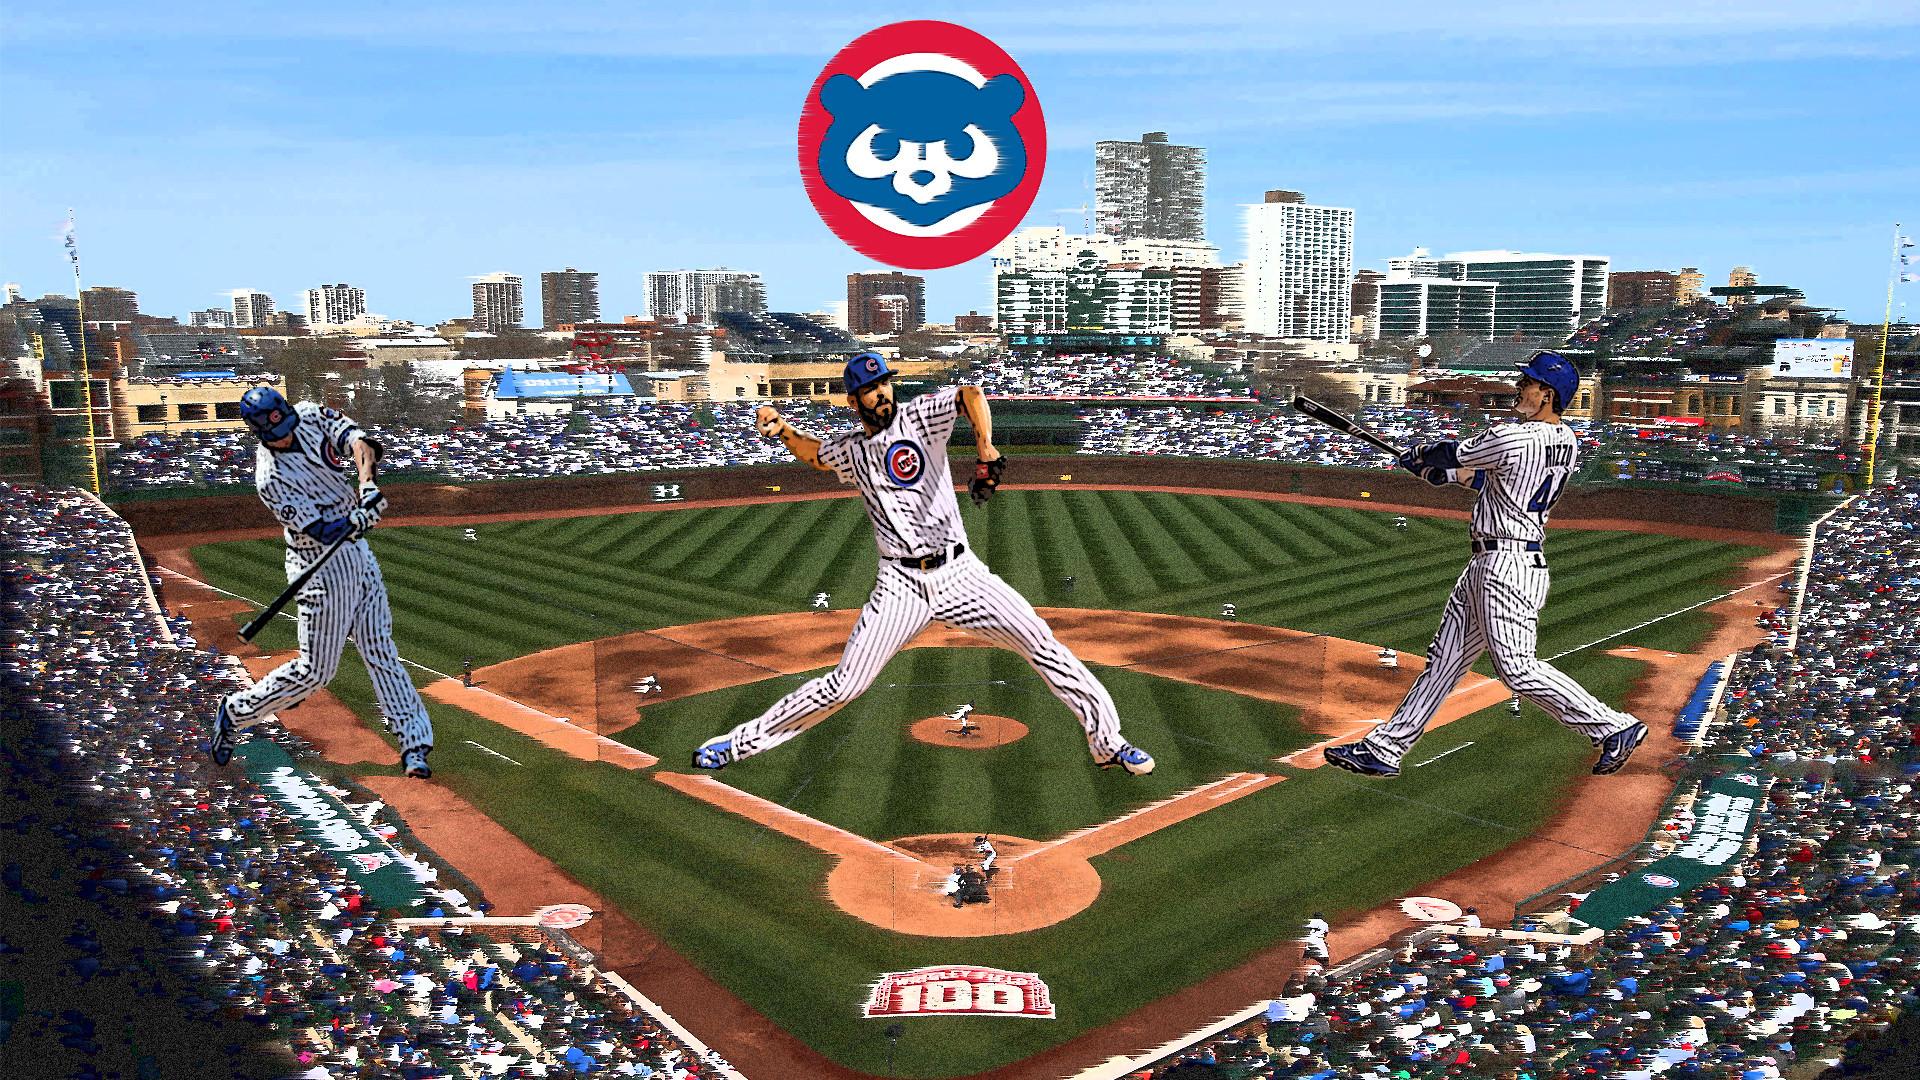 Chicago Cubs Wallpaper Team Sport Wallpapers HD | Cub News .